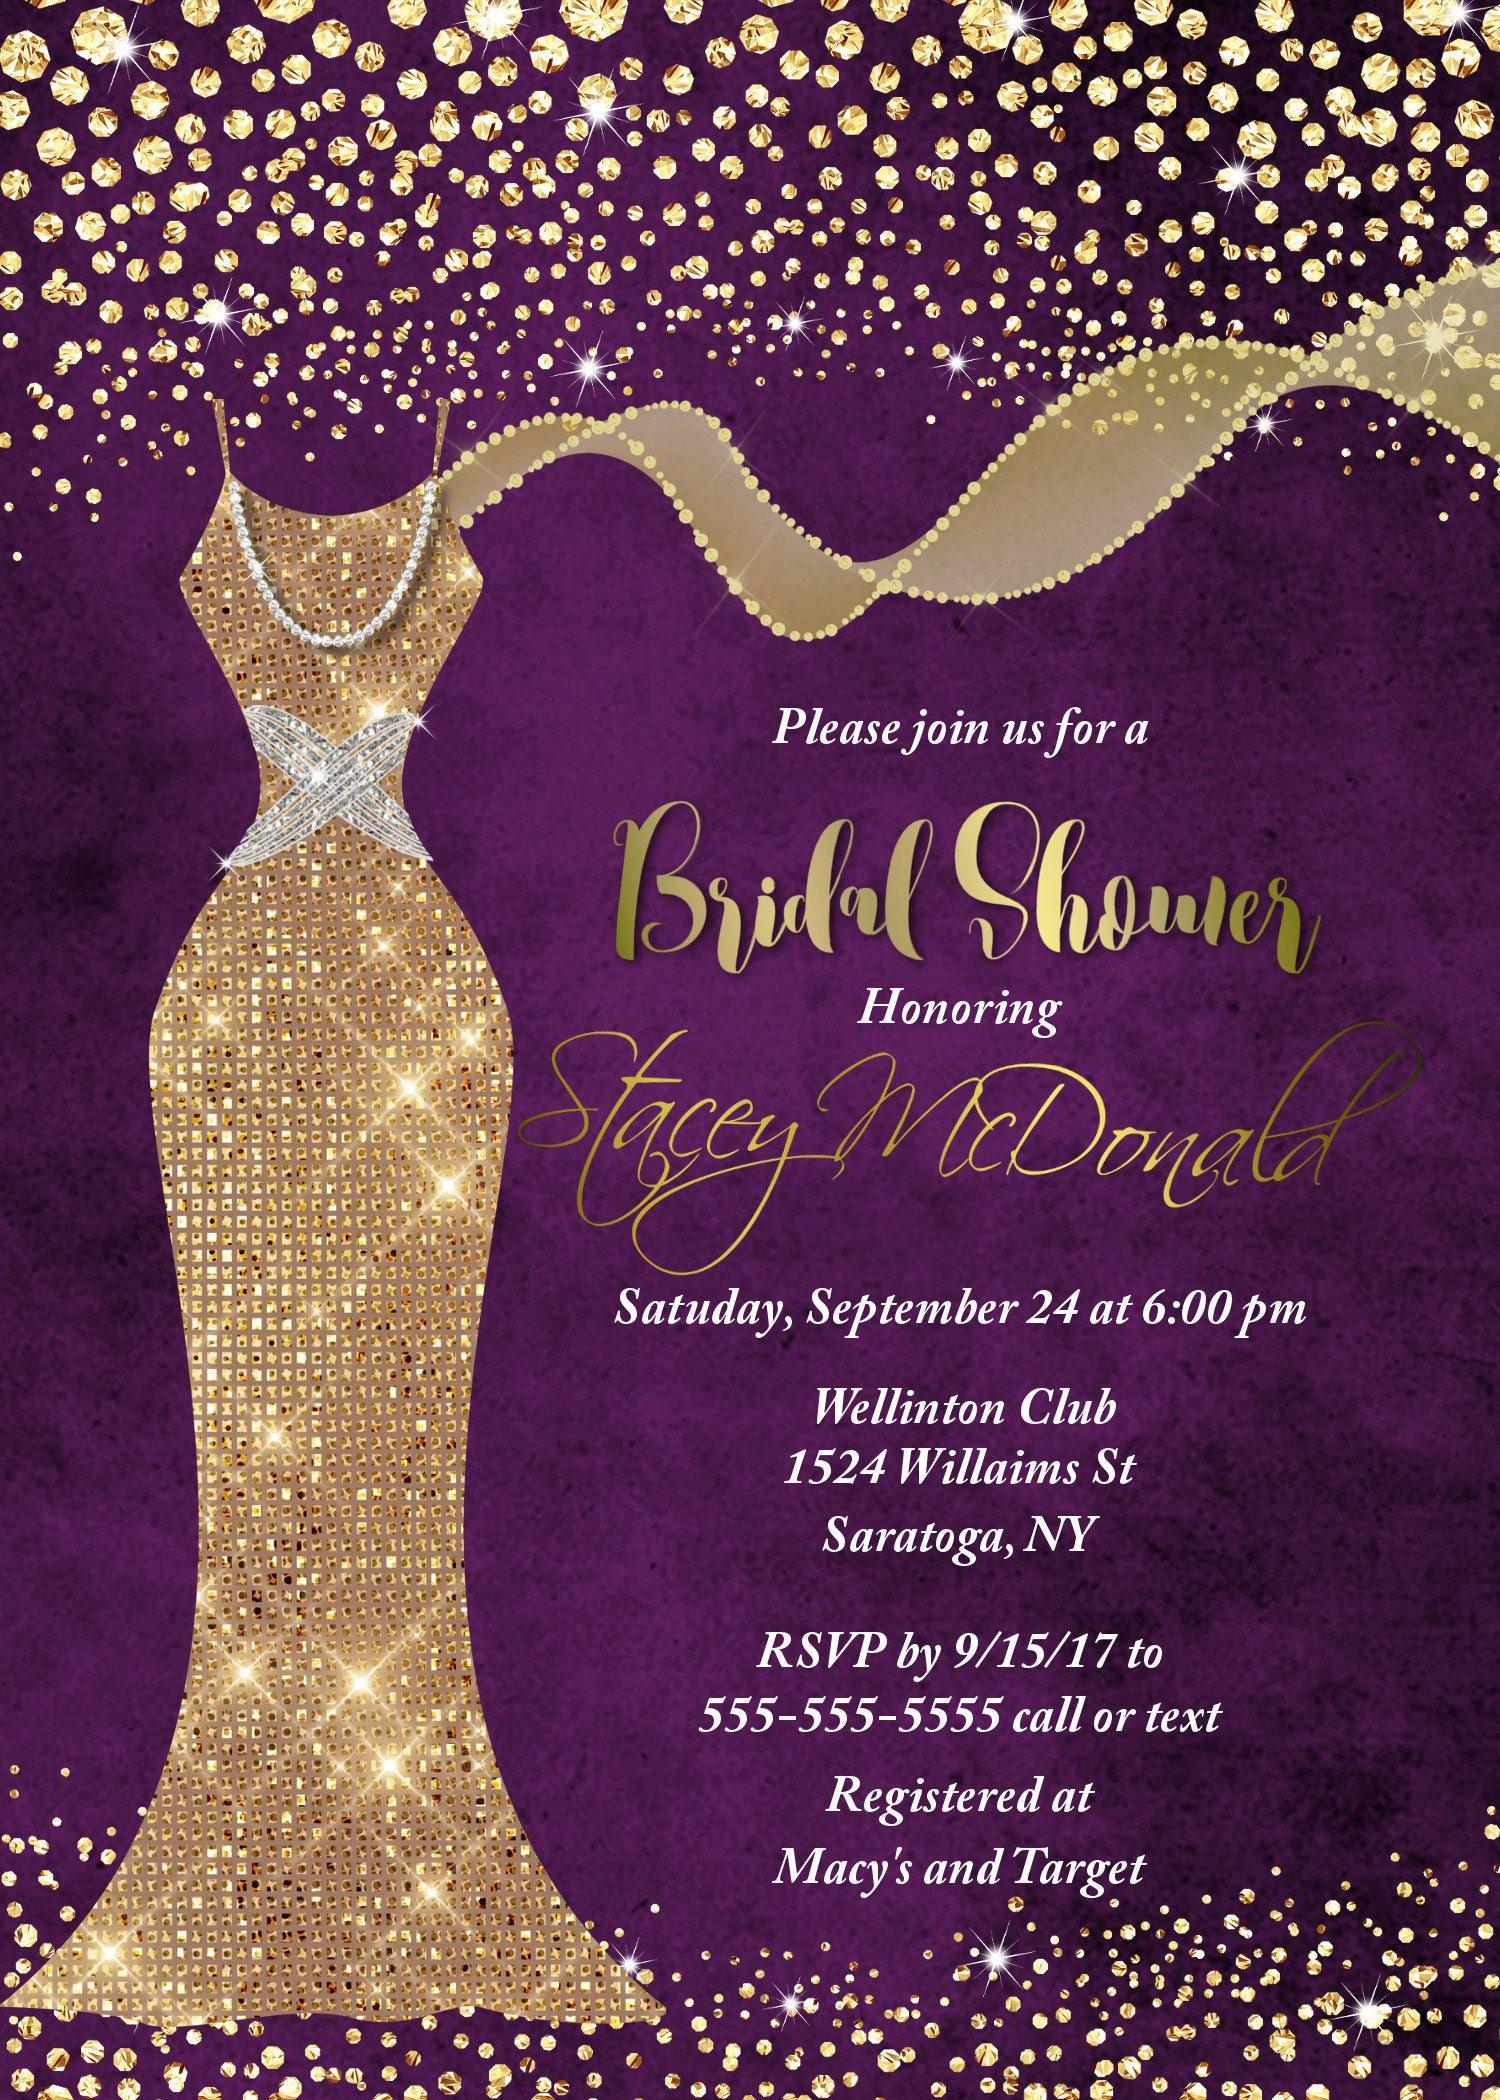 Purple and Gold Bridal shower invitation Bridal Shower Invitation – Wedding Dress Shower Invitations